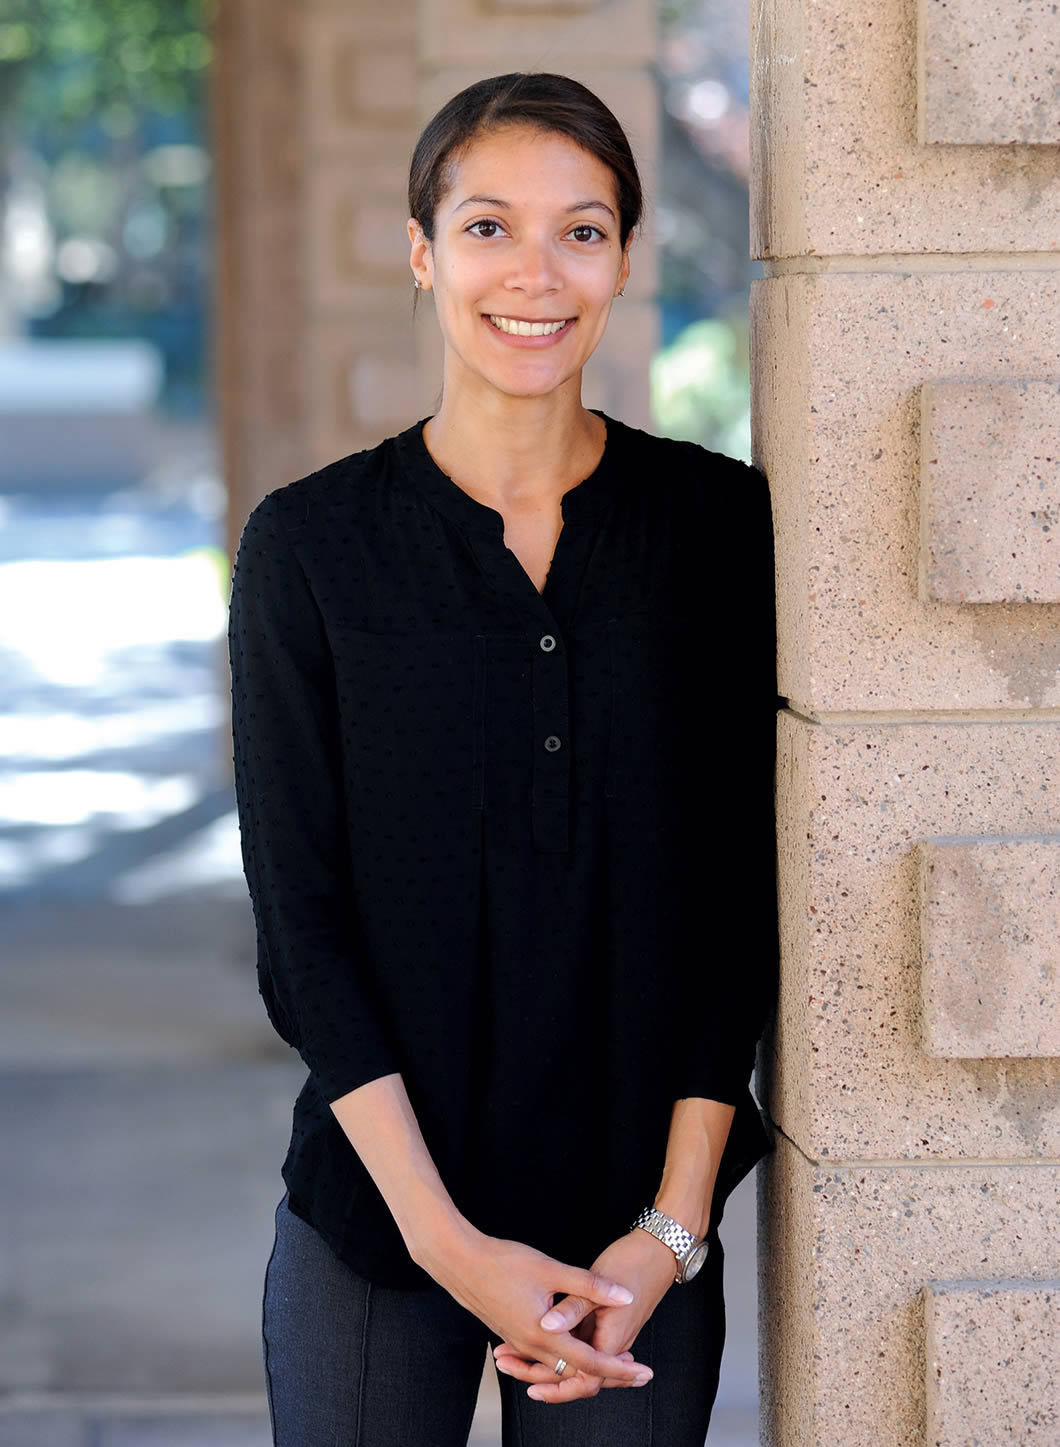 Beth Trushkowsky